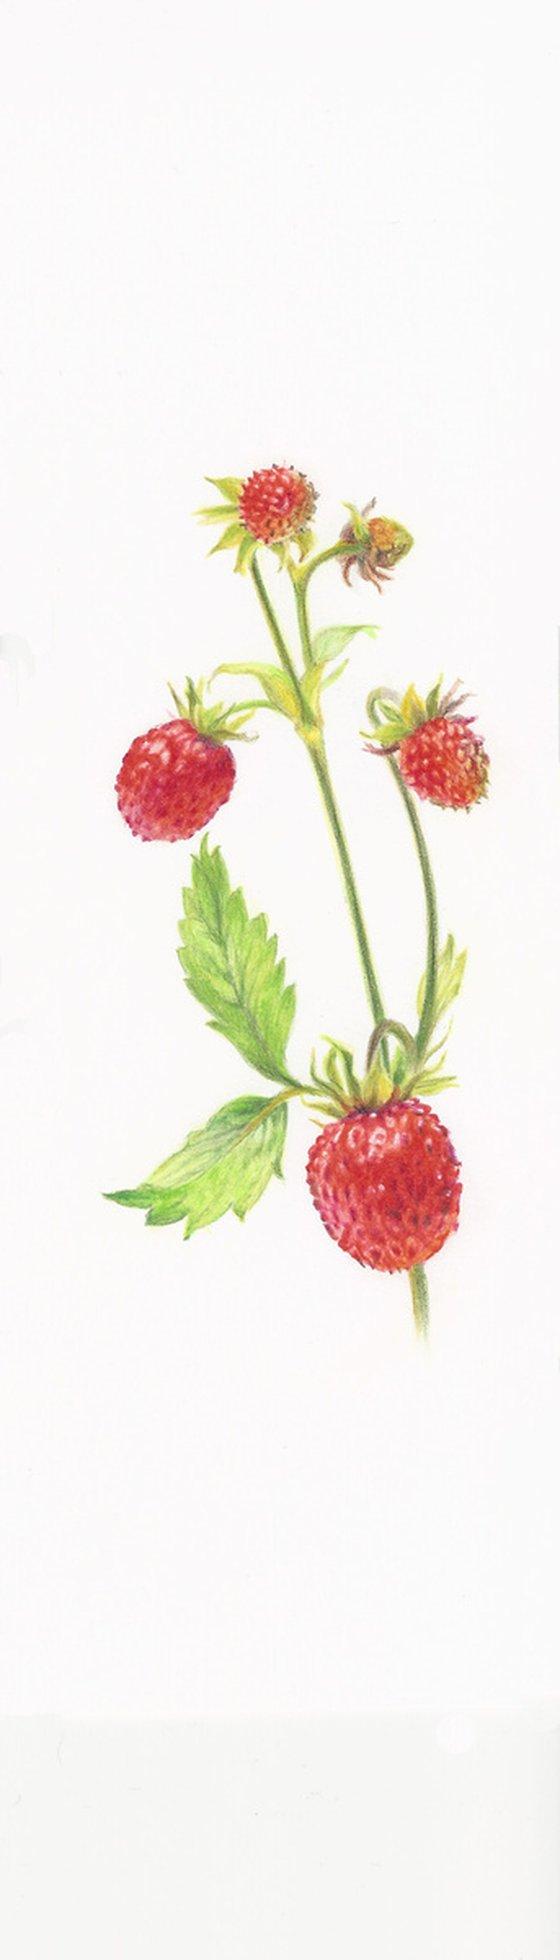 My Wild Berries as Bookmarks - The Wild Strawberries